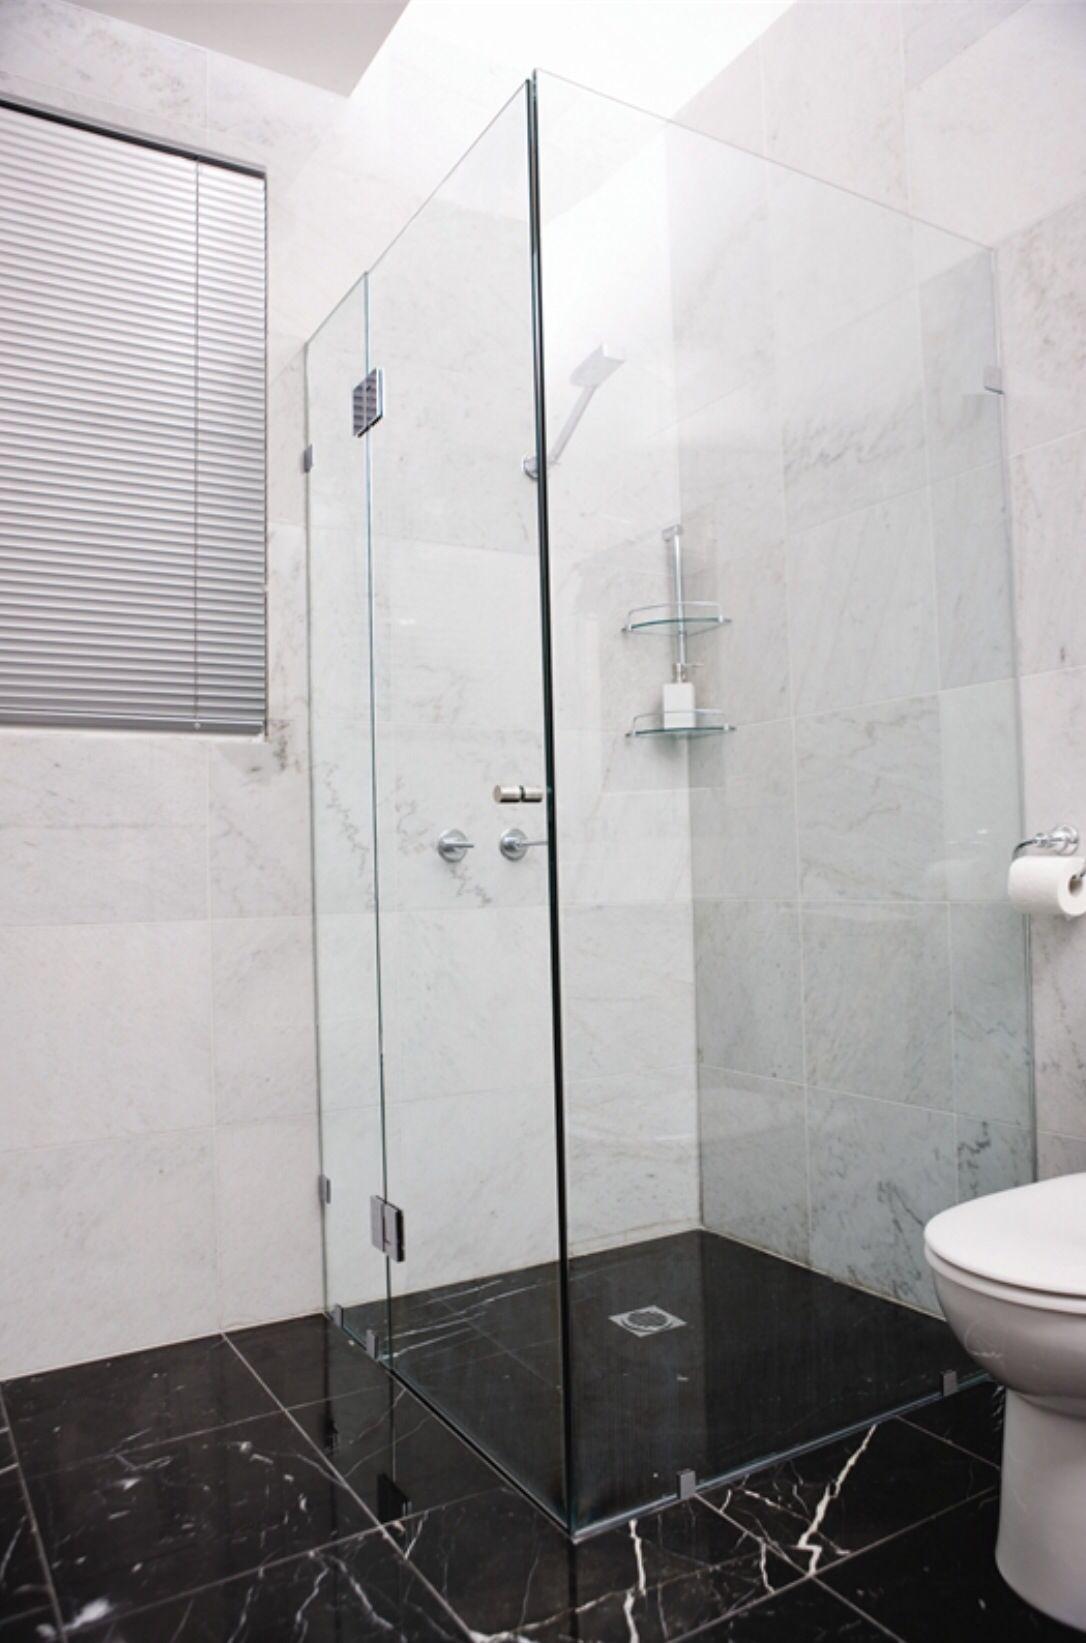 Screen | tiny corner shower ideas | Pinterest | Screens, Corner and Bath